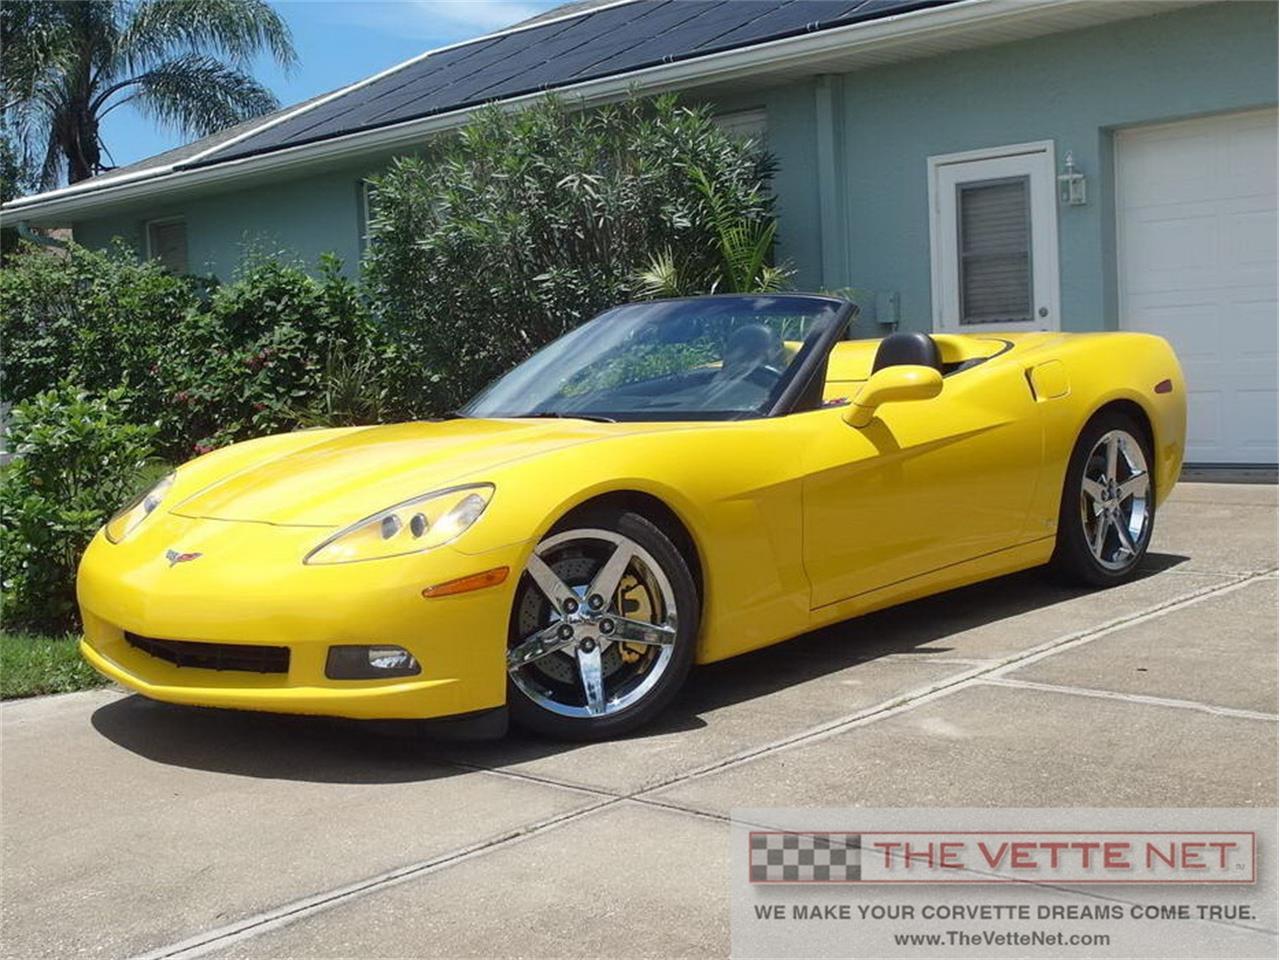 2006 Chevrolet Corvette (CC-1030175) for sale in Sarasota, Florida